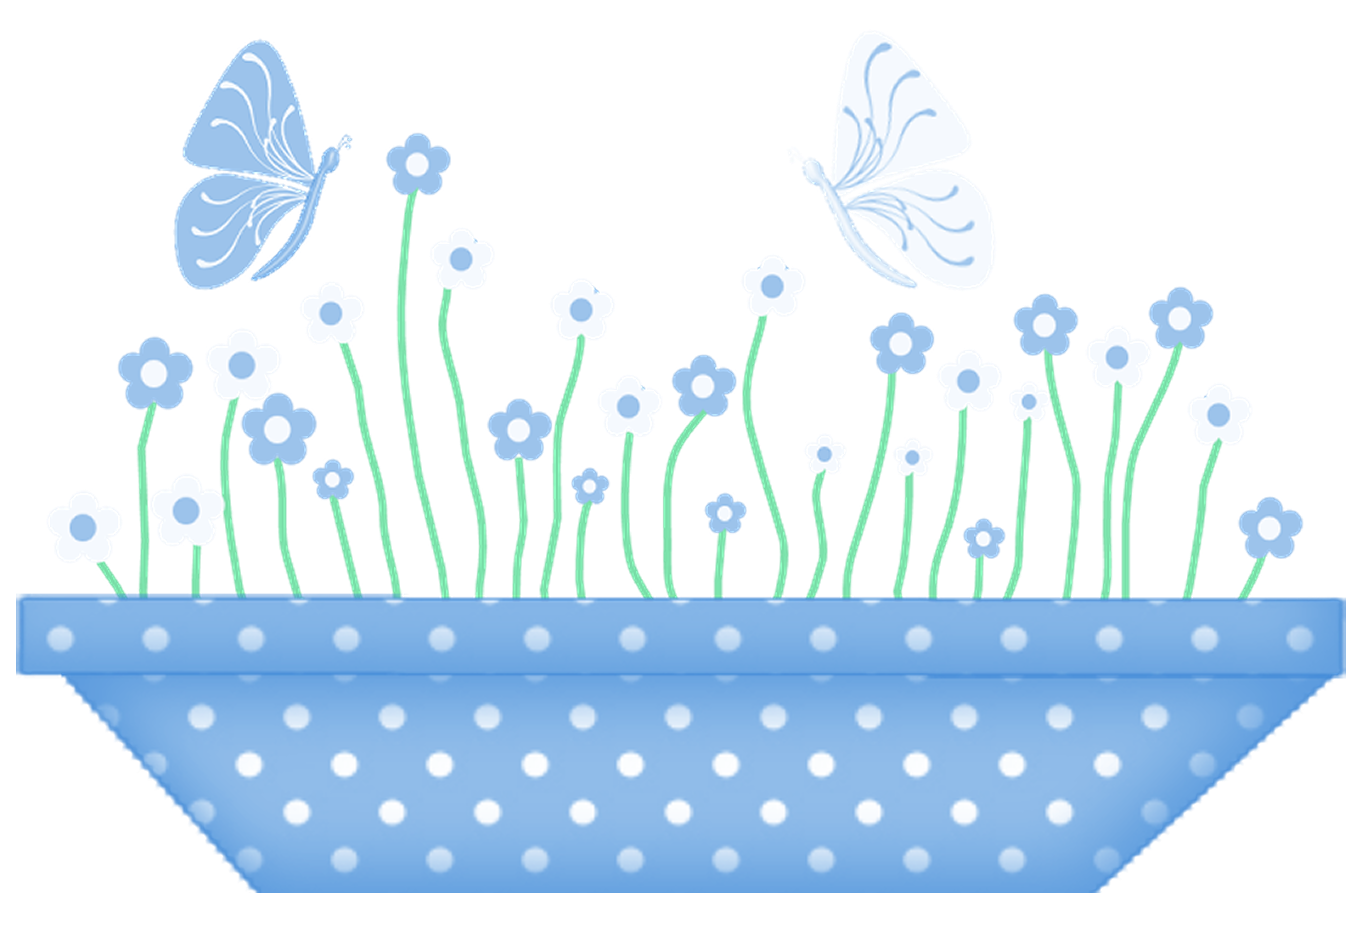 Pin by marina on. Friendship clipart friendship flower